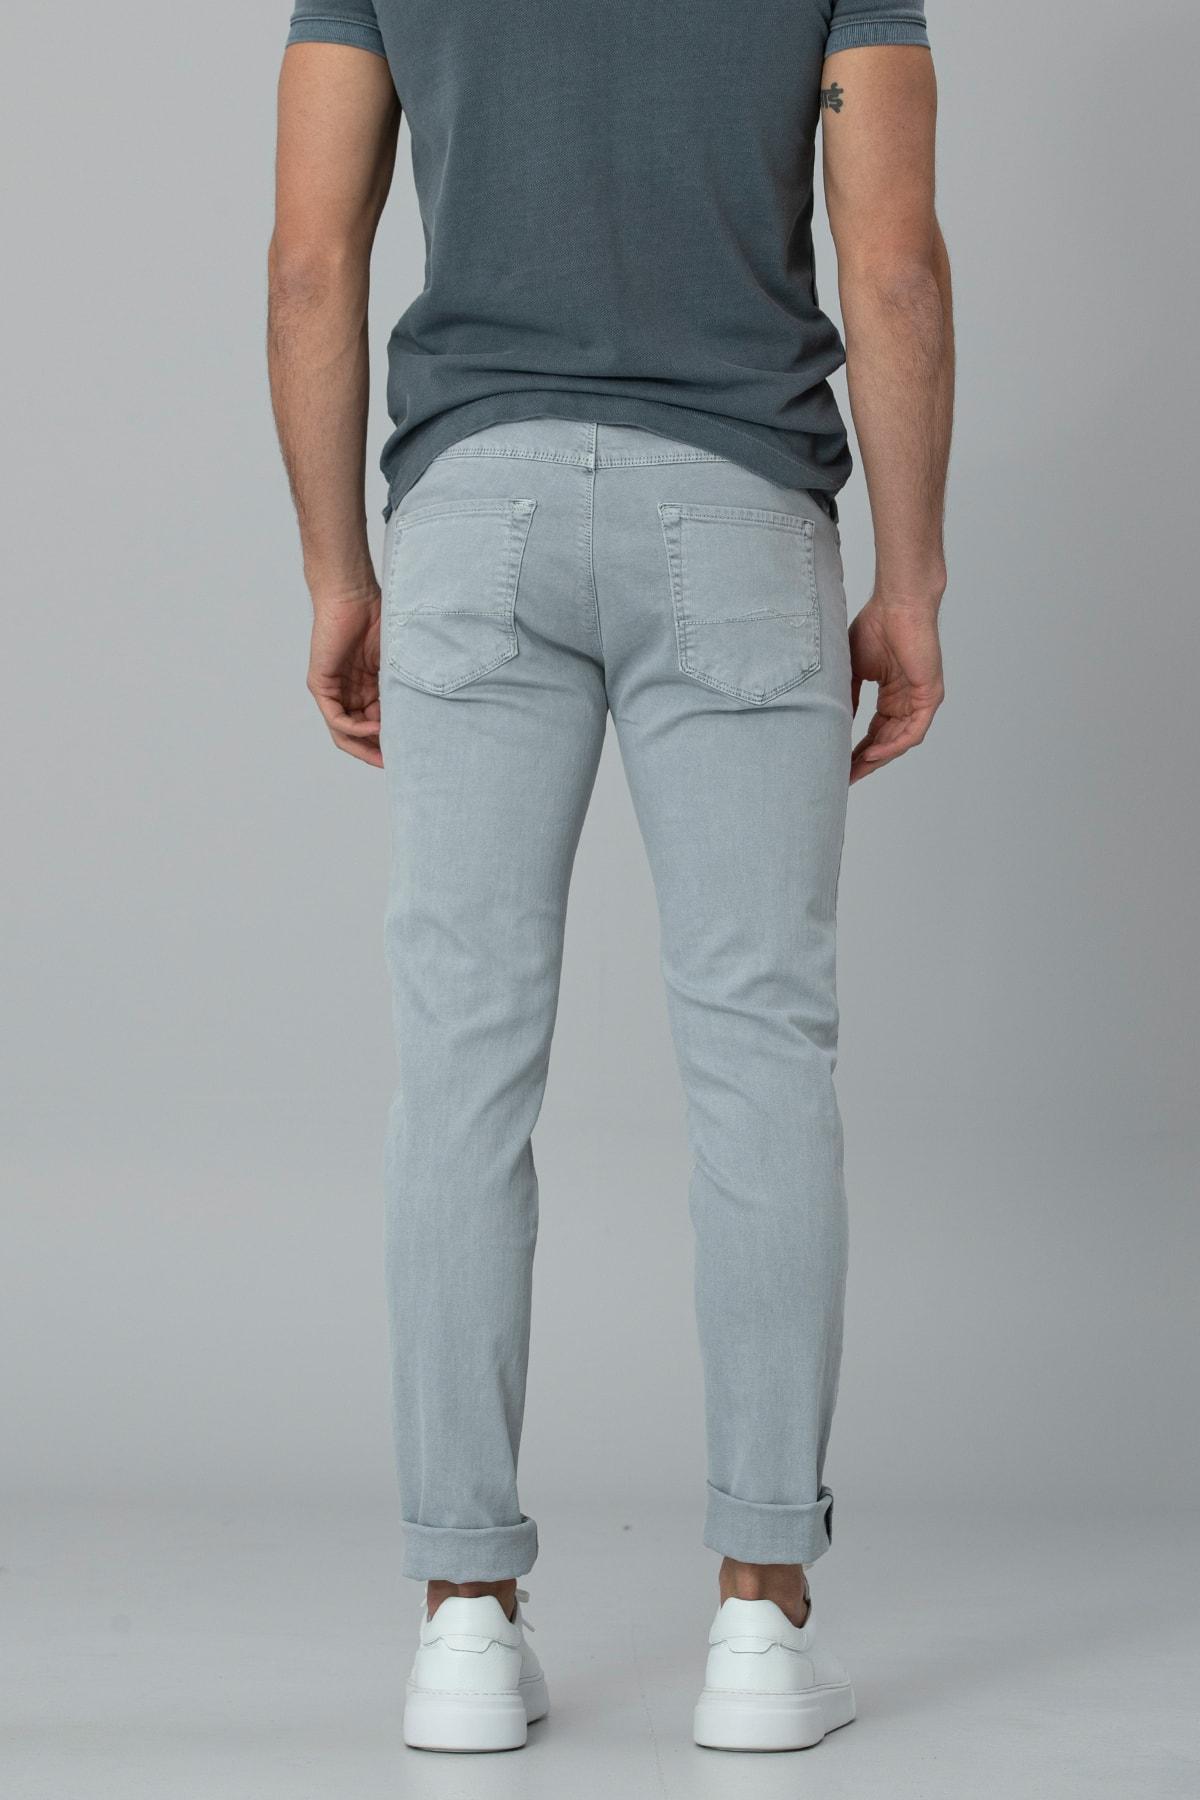 Lufian Kropi Spor 5 Cep Pantolon Slim Fit Gri 3